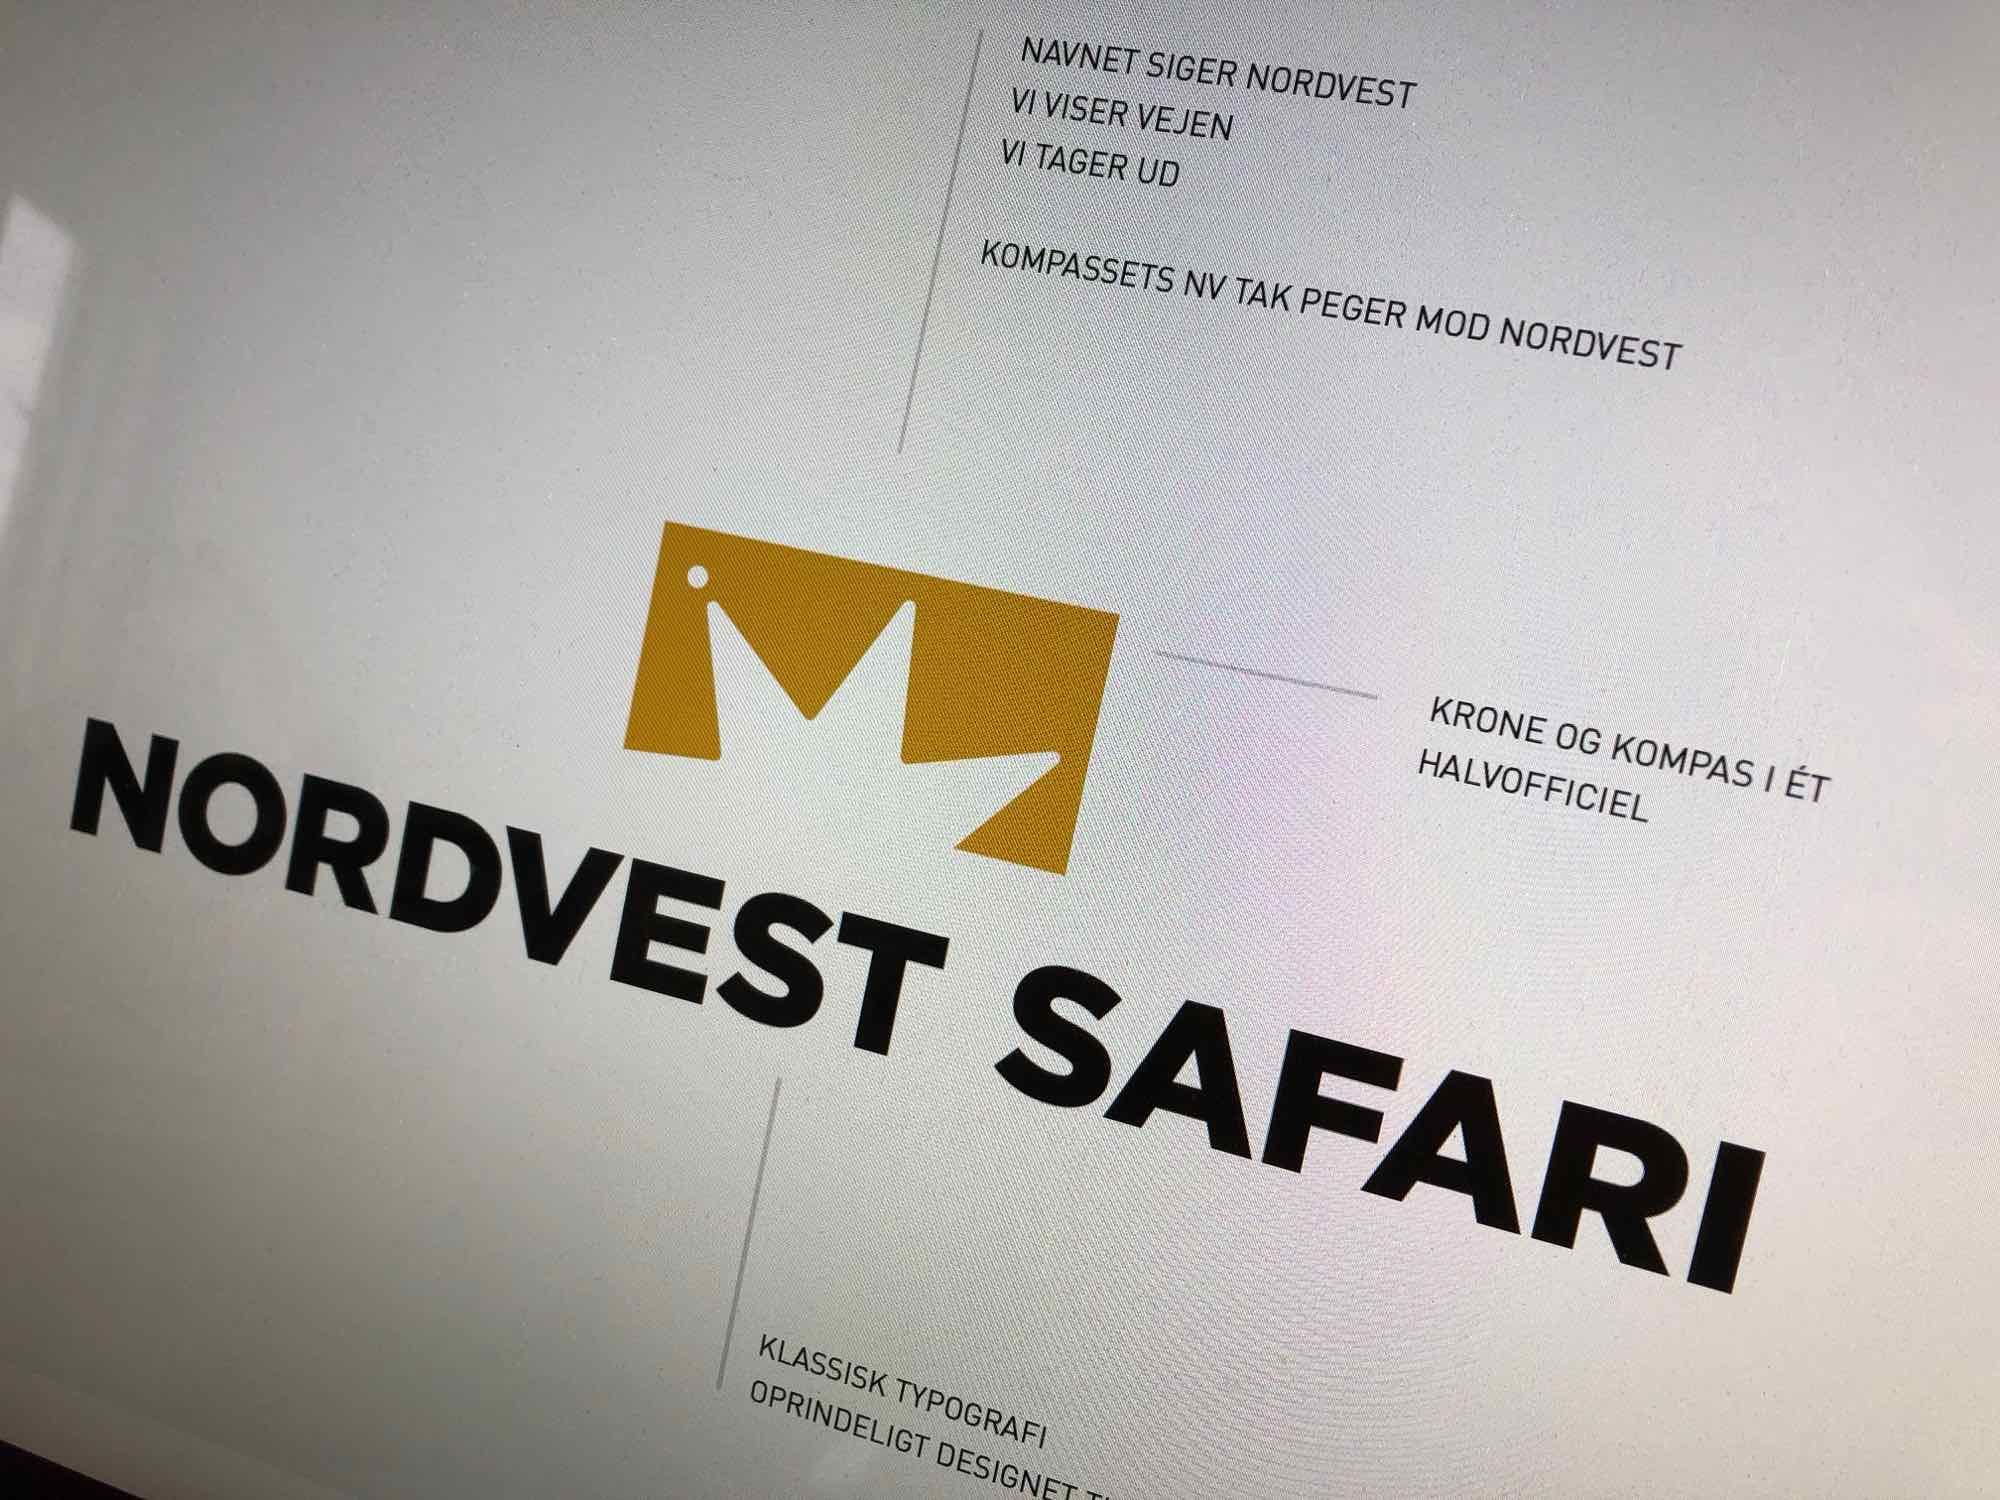 nordvest safari design - 1.jpg